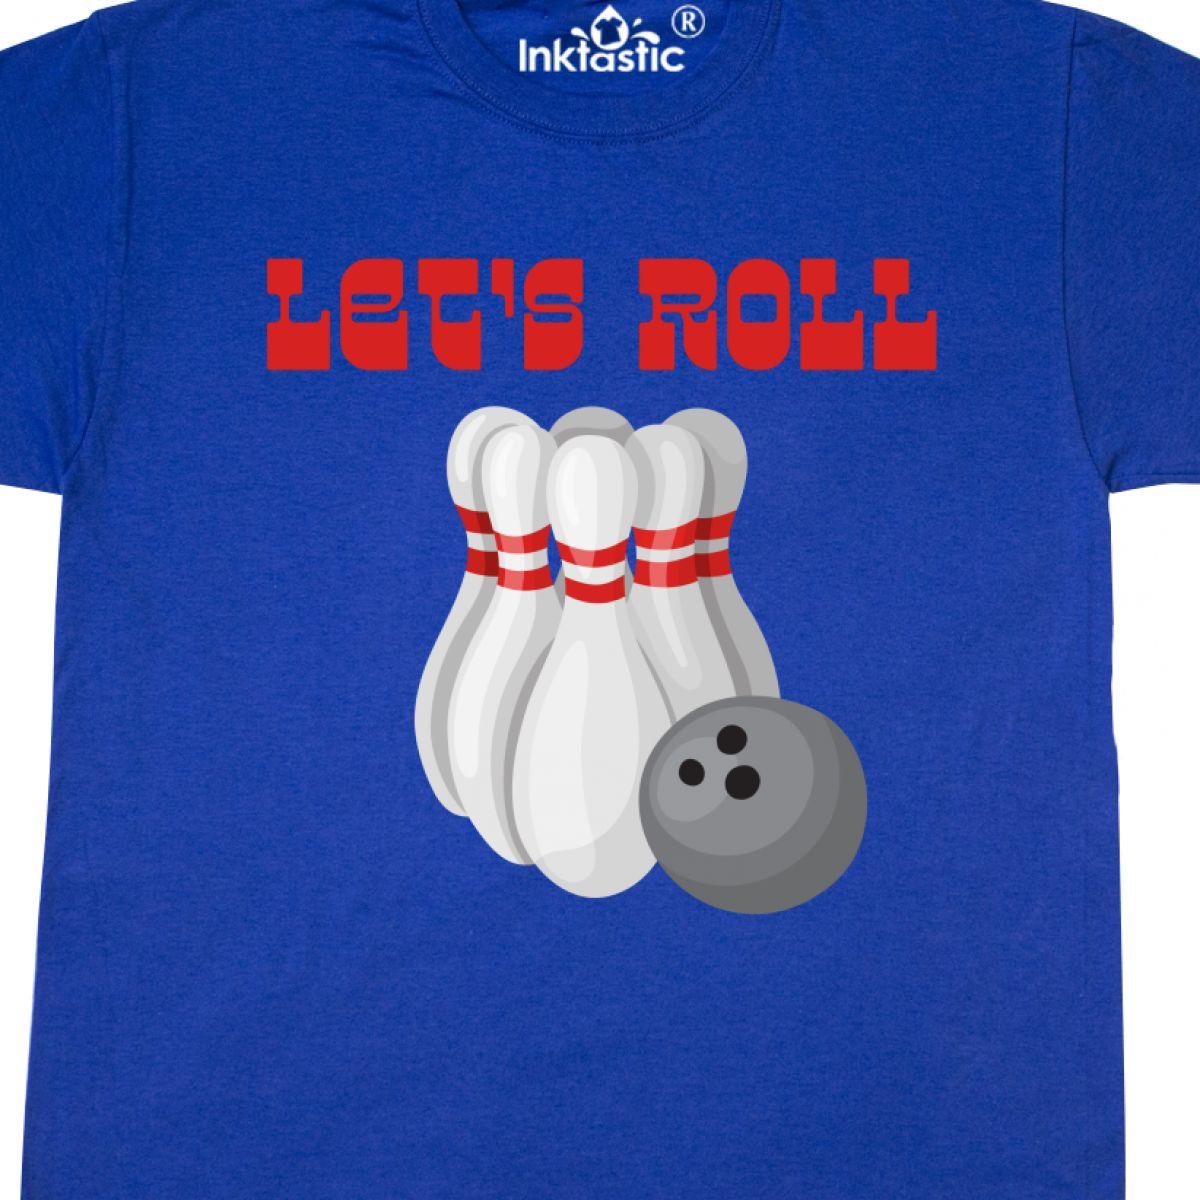 fdb2335b Inktastic Let's Roll Bowling T-Shirt Funny League Pins Spare Strike ...